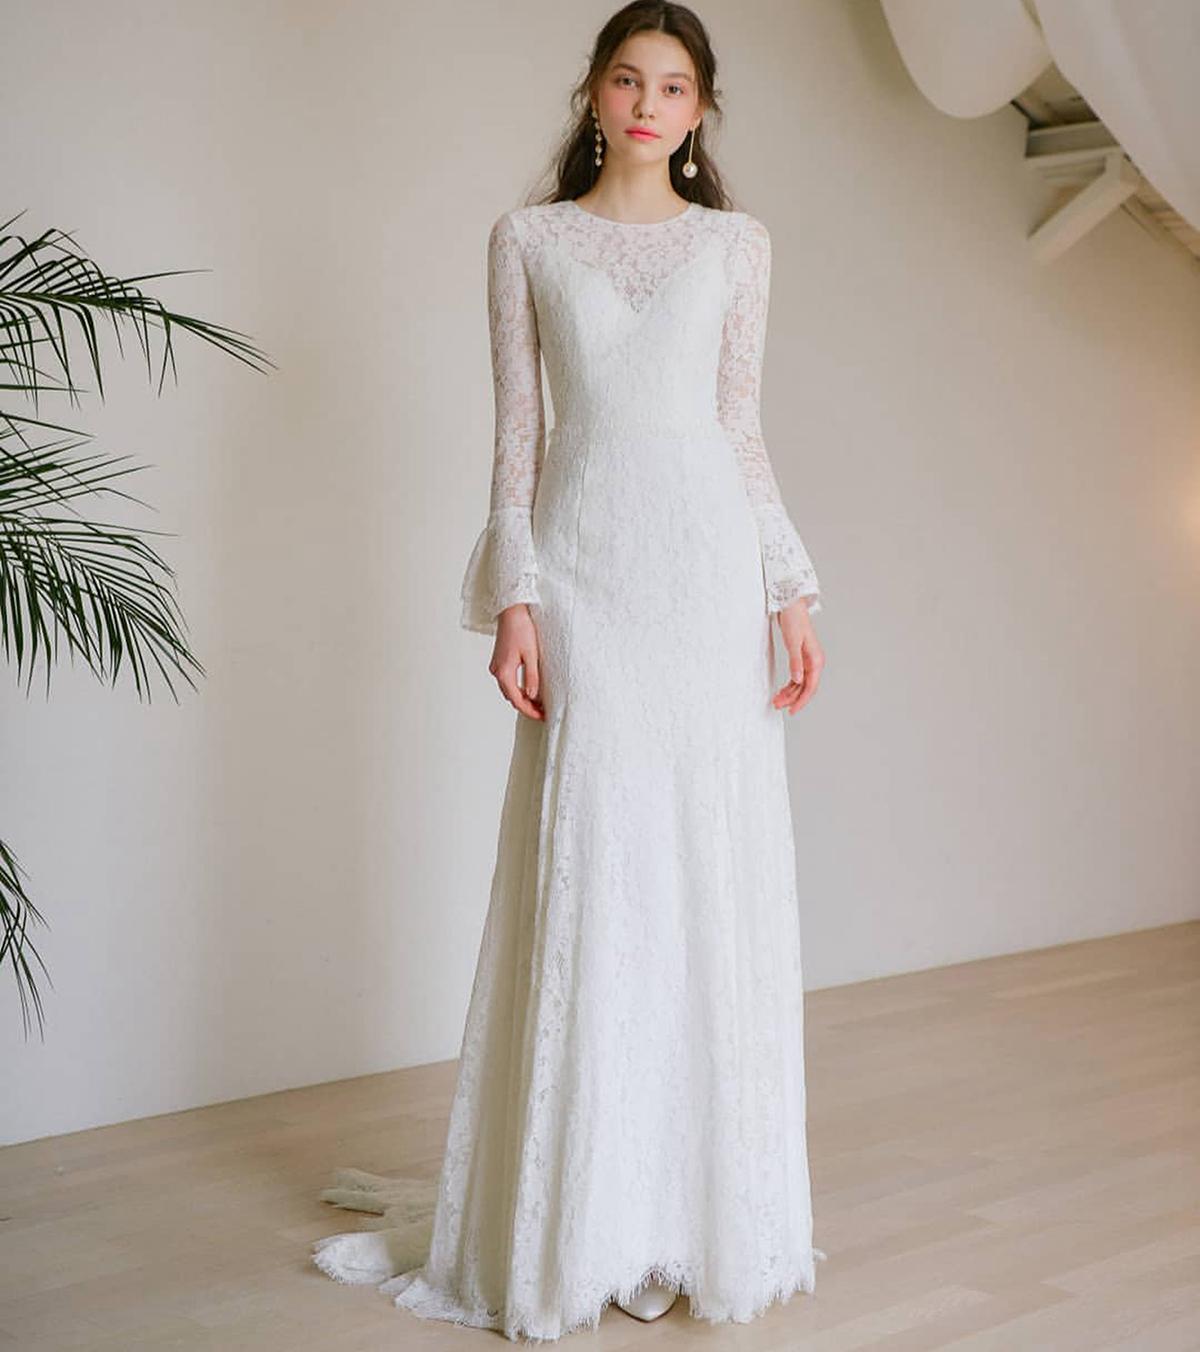 Elegant Full Lace Mermaid Wedding Dresses Bell Long Sleeve 2021 Jewel Neck Sweep Train Bride Formal Bridal Gowns Cheap Engagement Dress